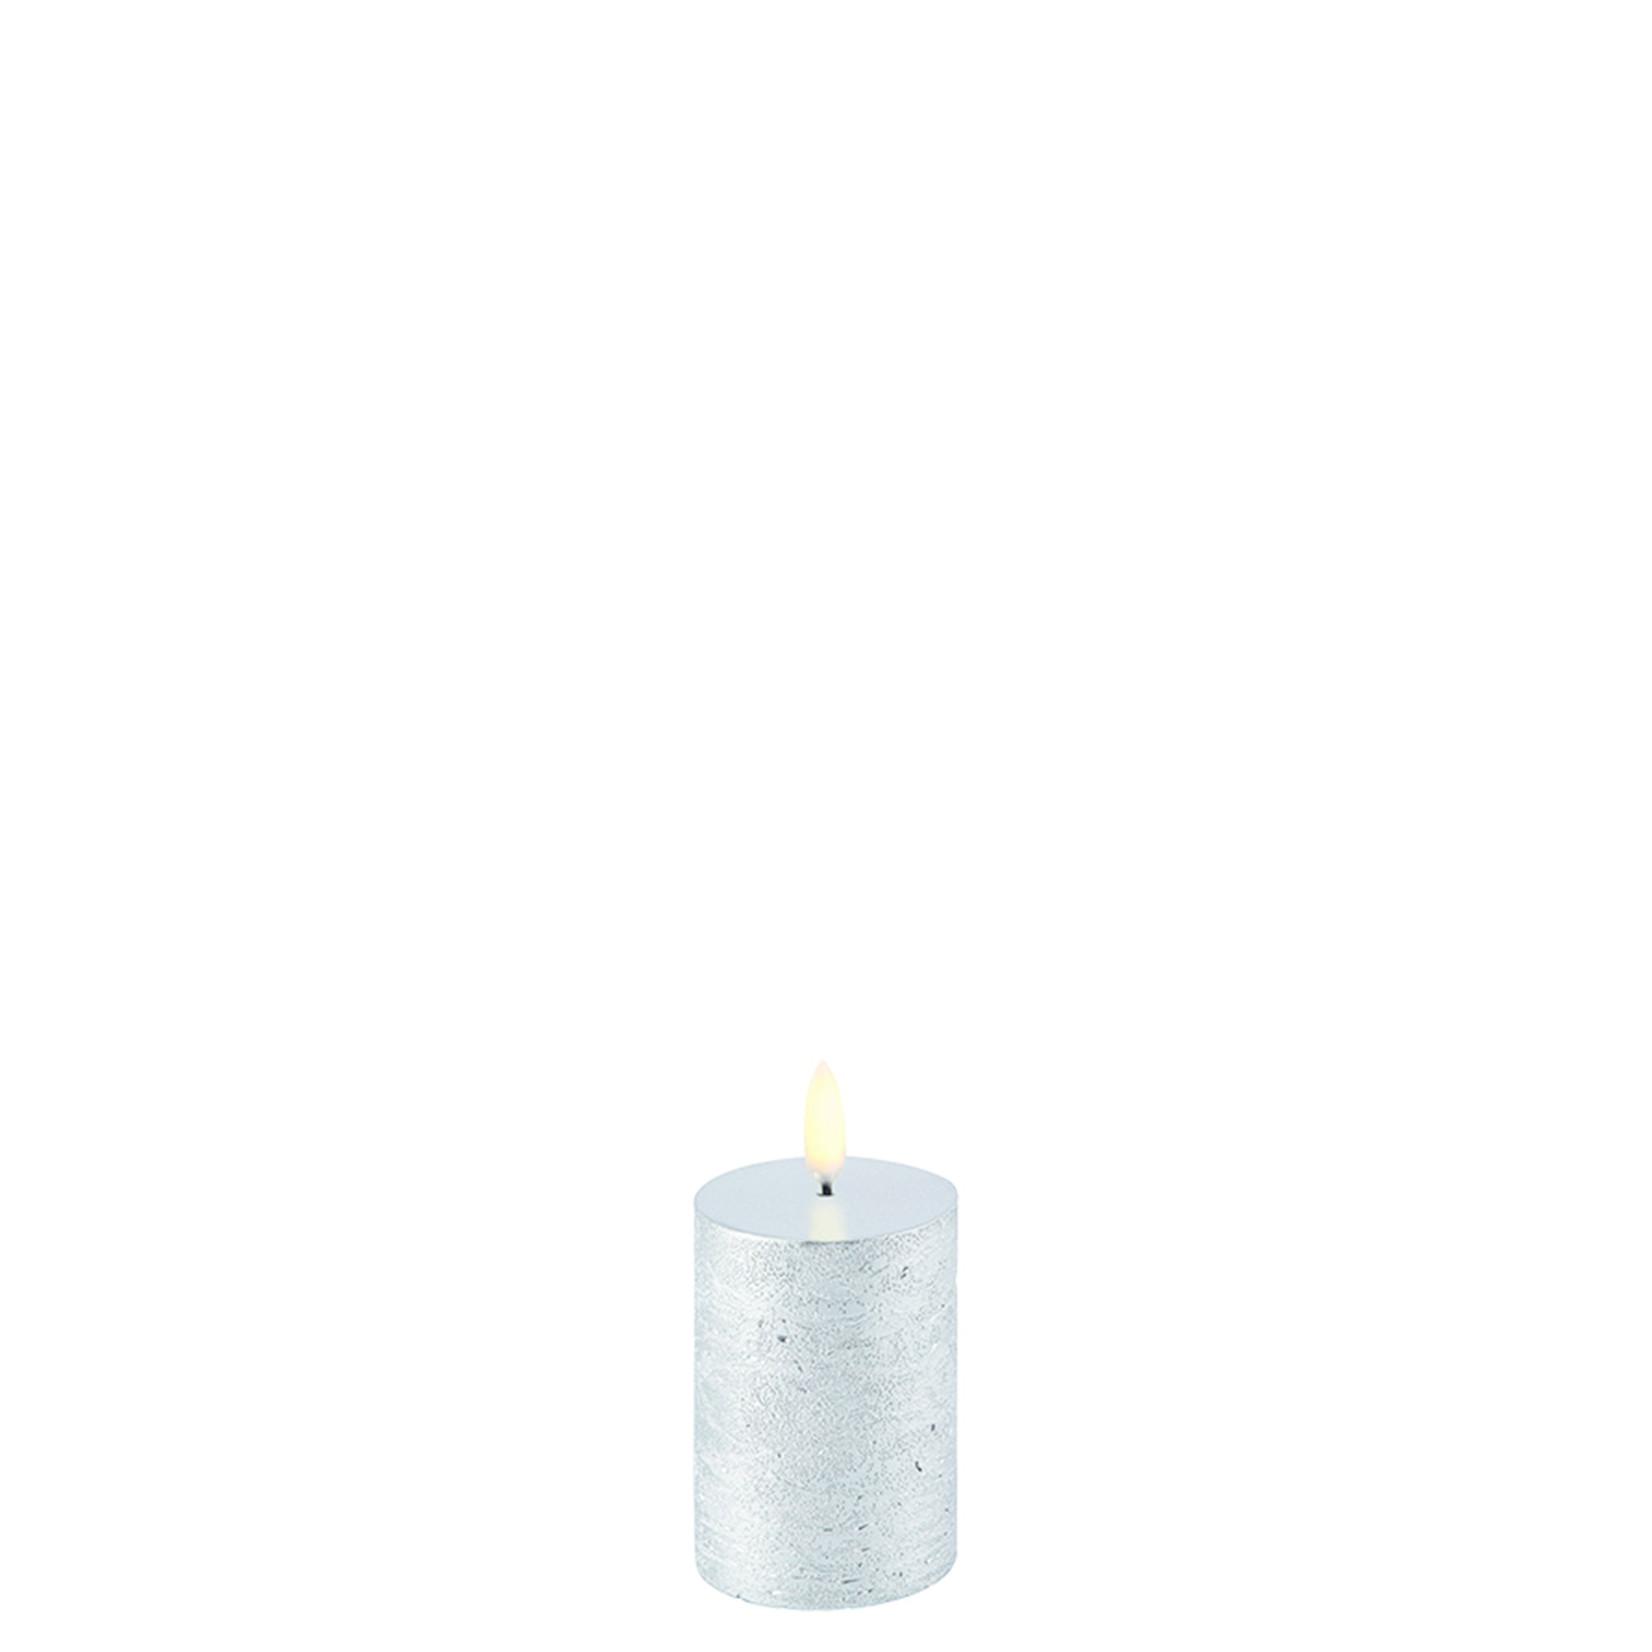 UYUNI LIGHTING LED PILLAR CANDLE - METALLIC SILVER - Ø5 x 7,5 CM